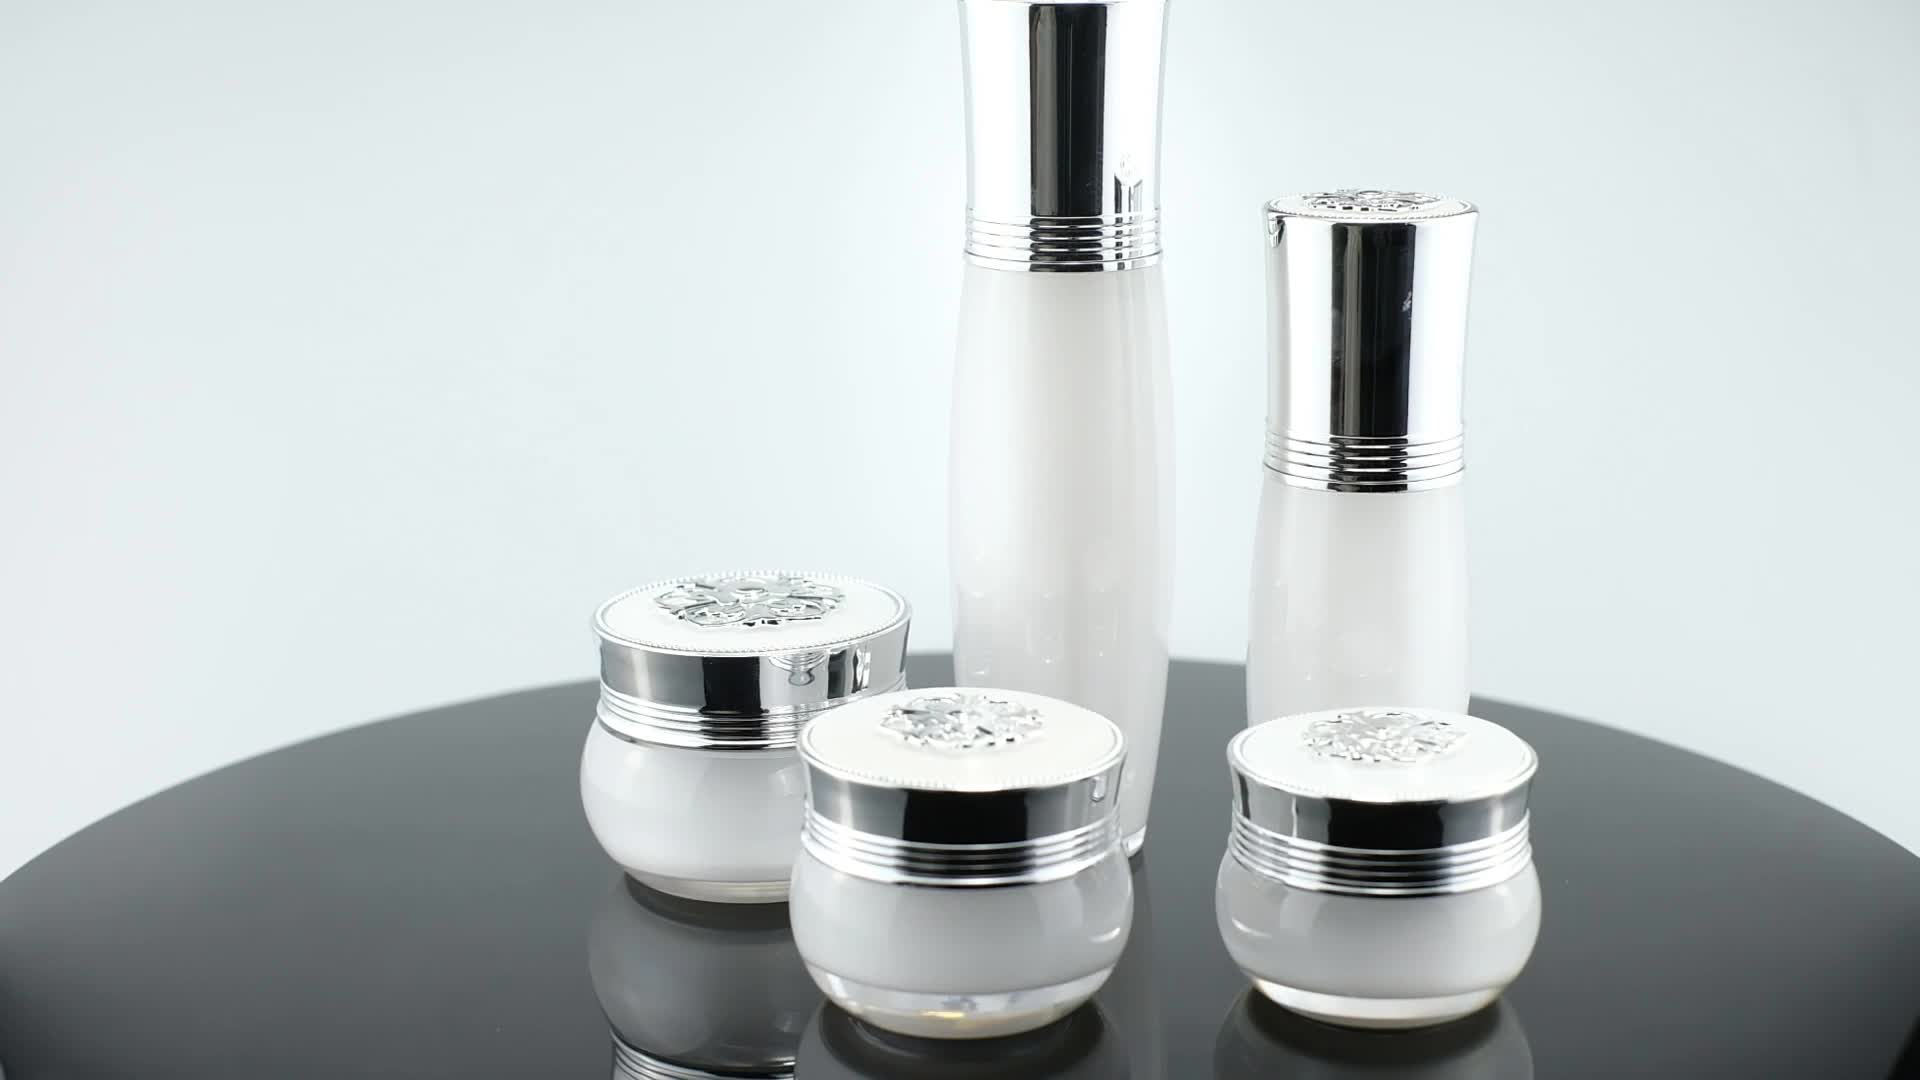 (Jar-10g/15g/20g/30g)(Bottle-15ml/20ml/30ml/50ml)New Design Pearl White bottle Luxury Acrylic Empty Cream Jar Set